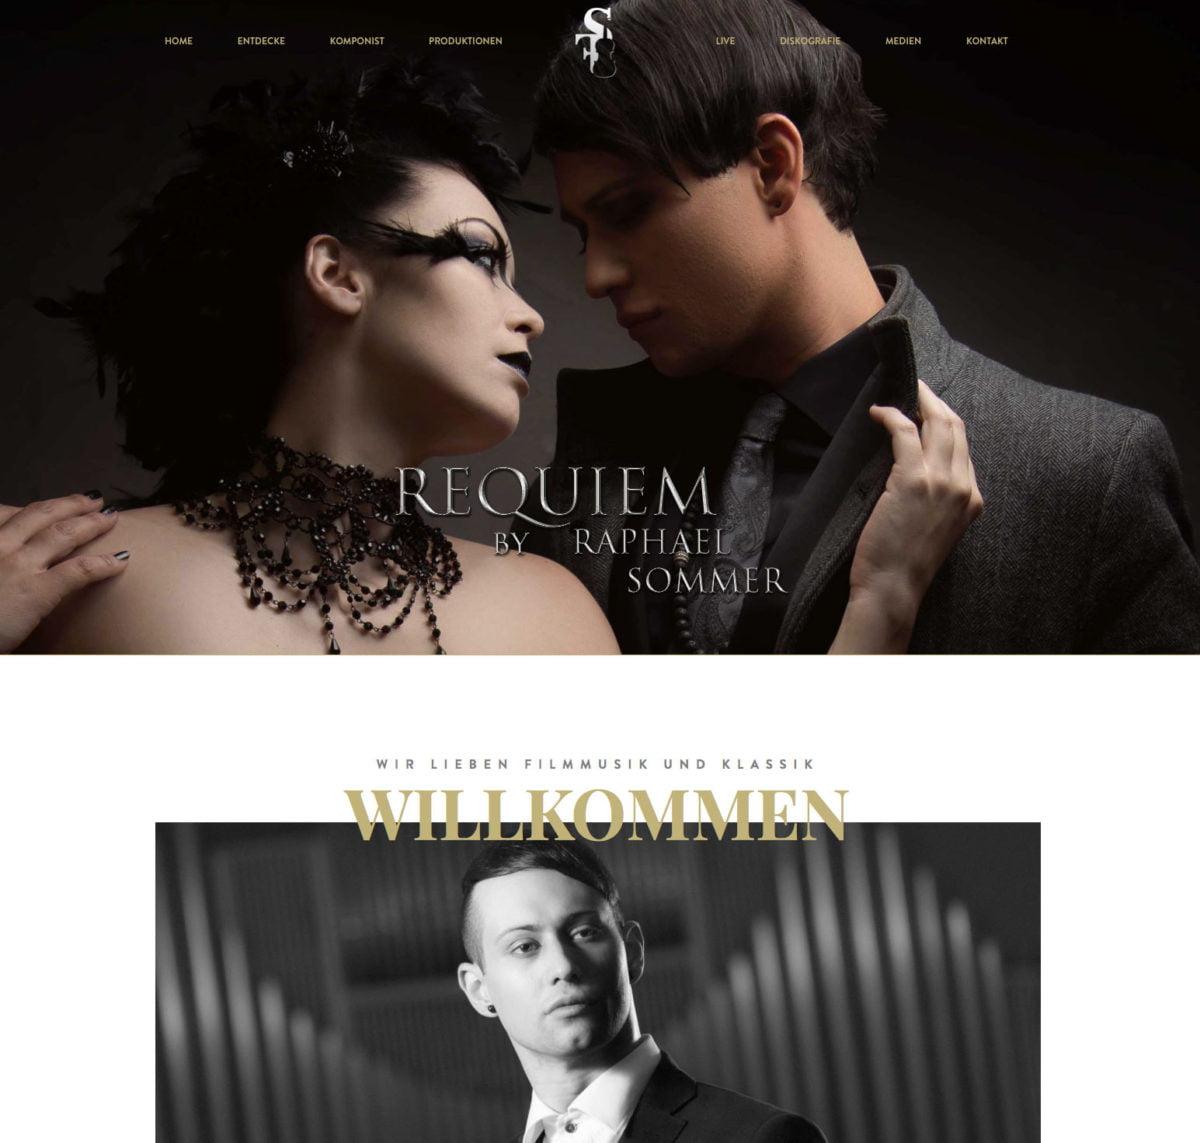 Sommerfilmmusic Website Screenshot